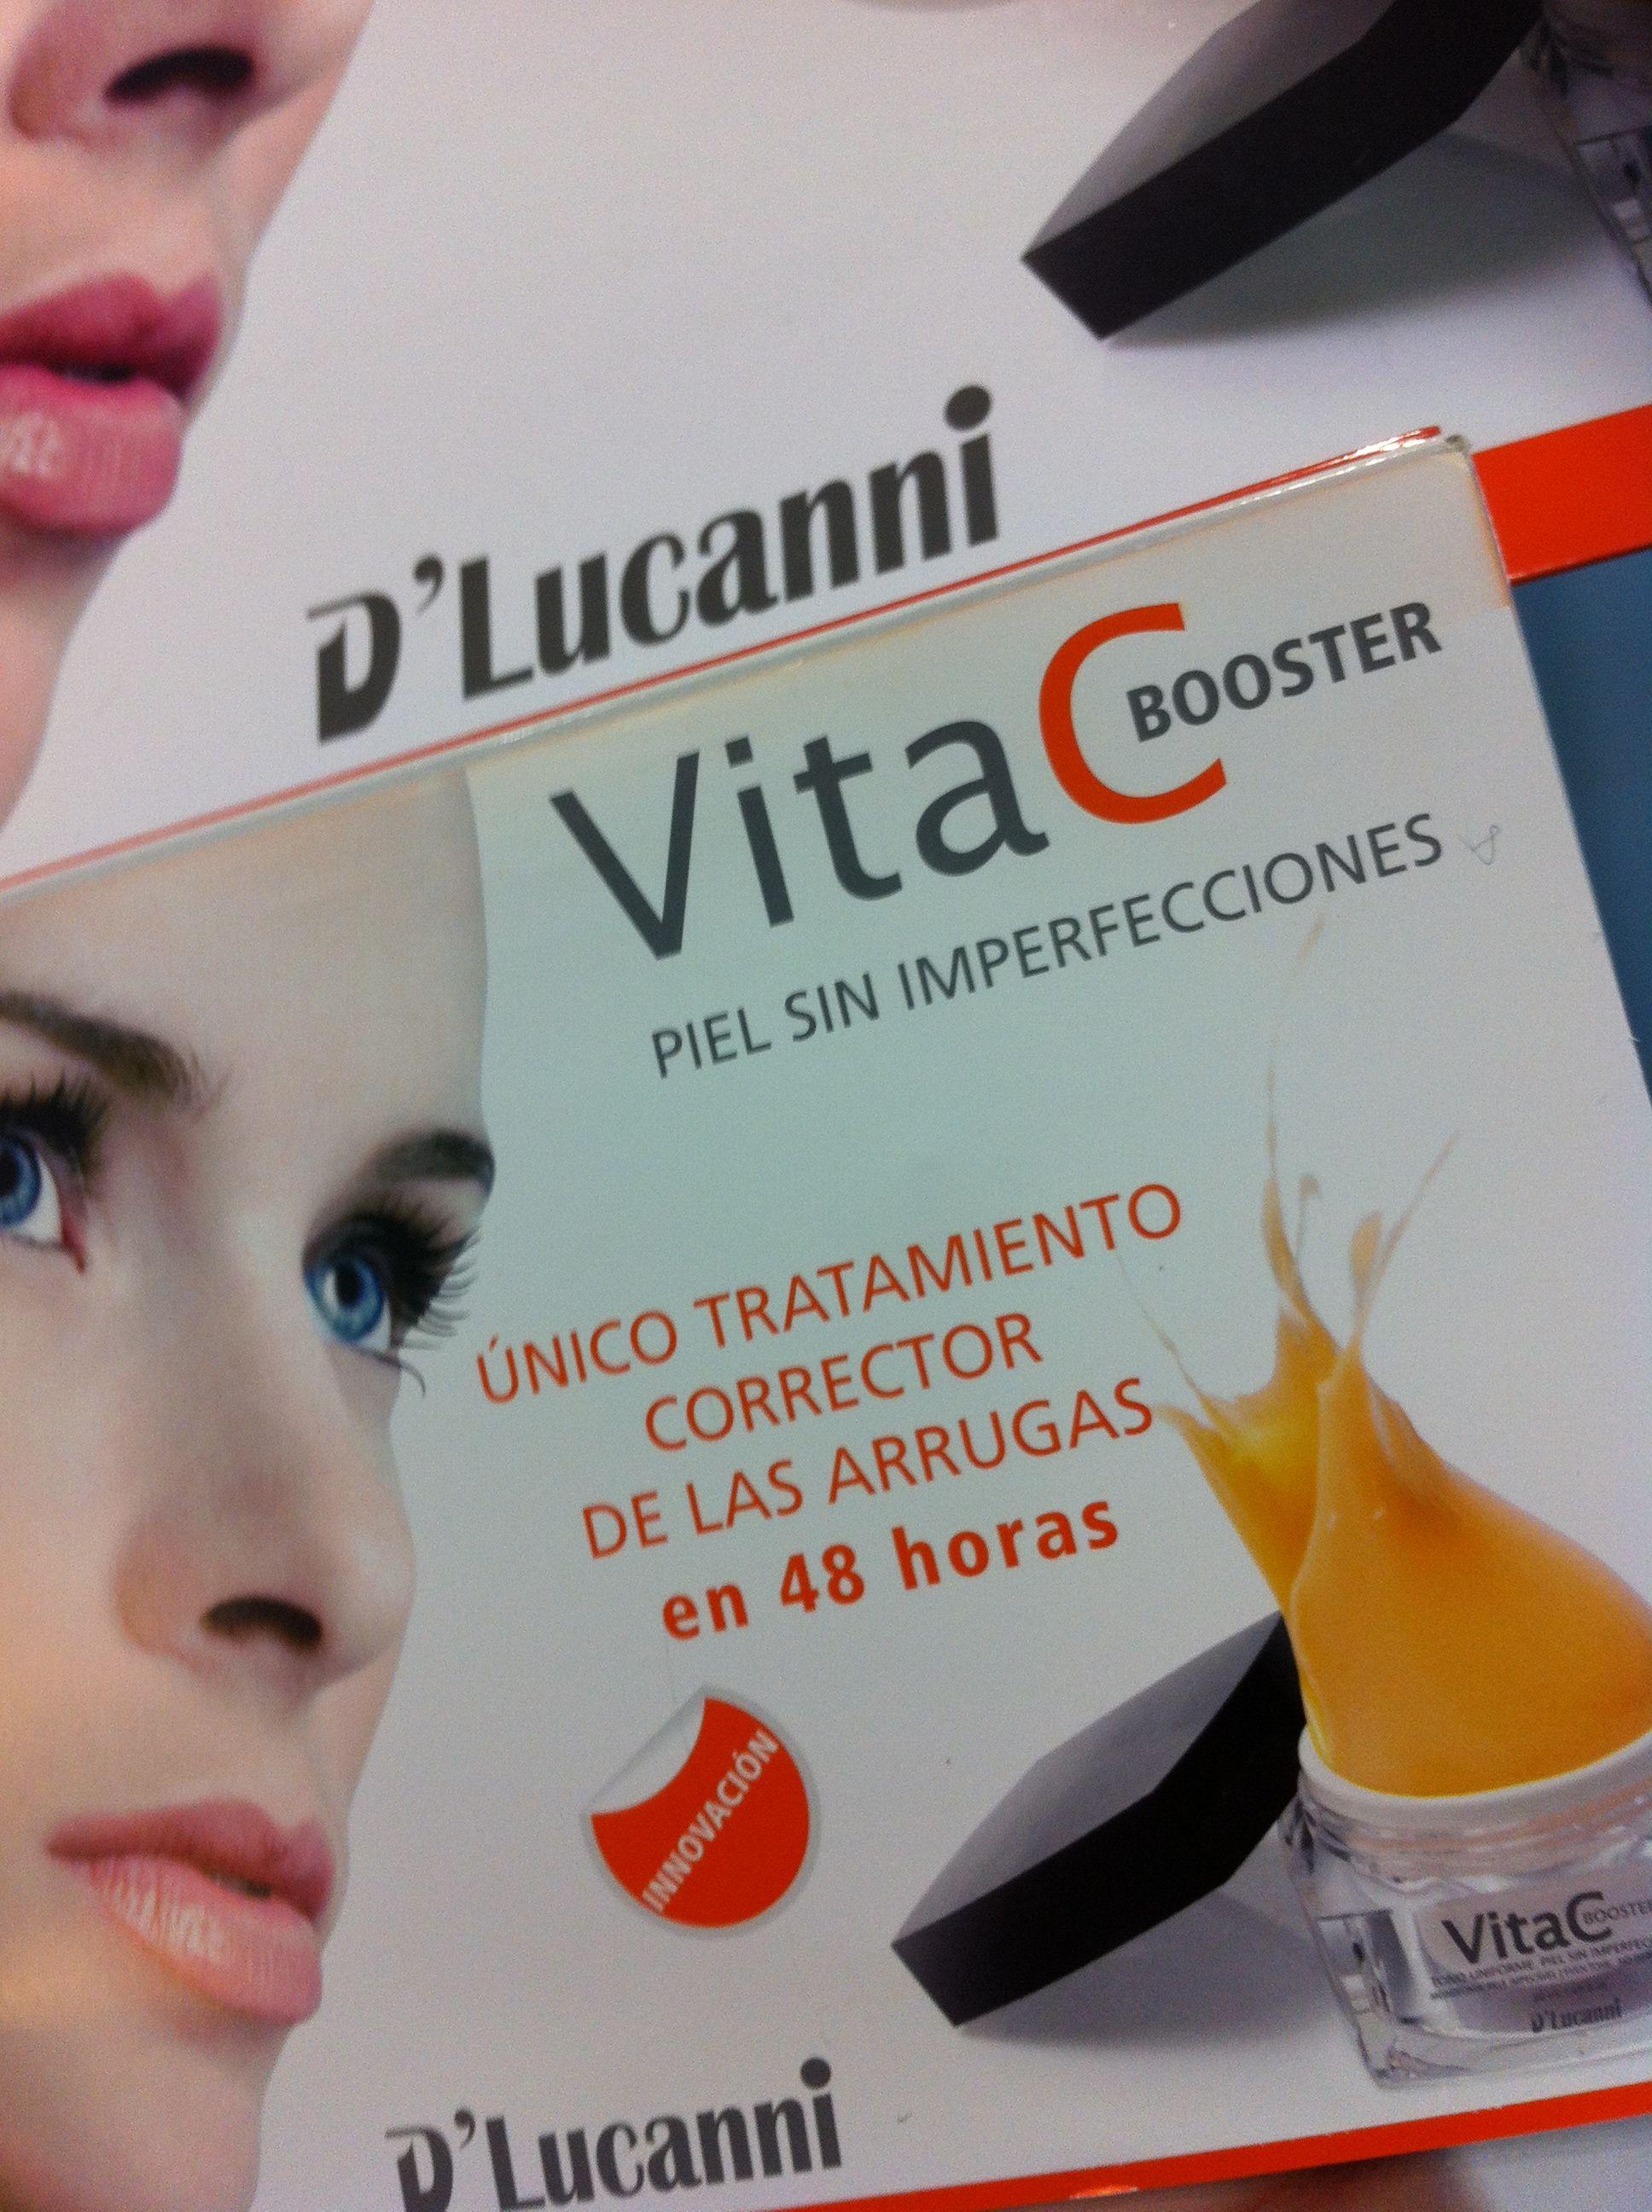 Vitamina C \u002D D´Lucanni